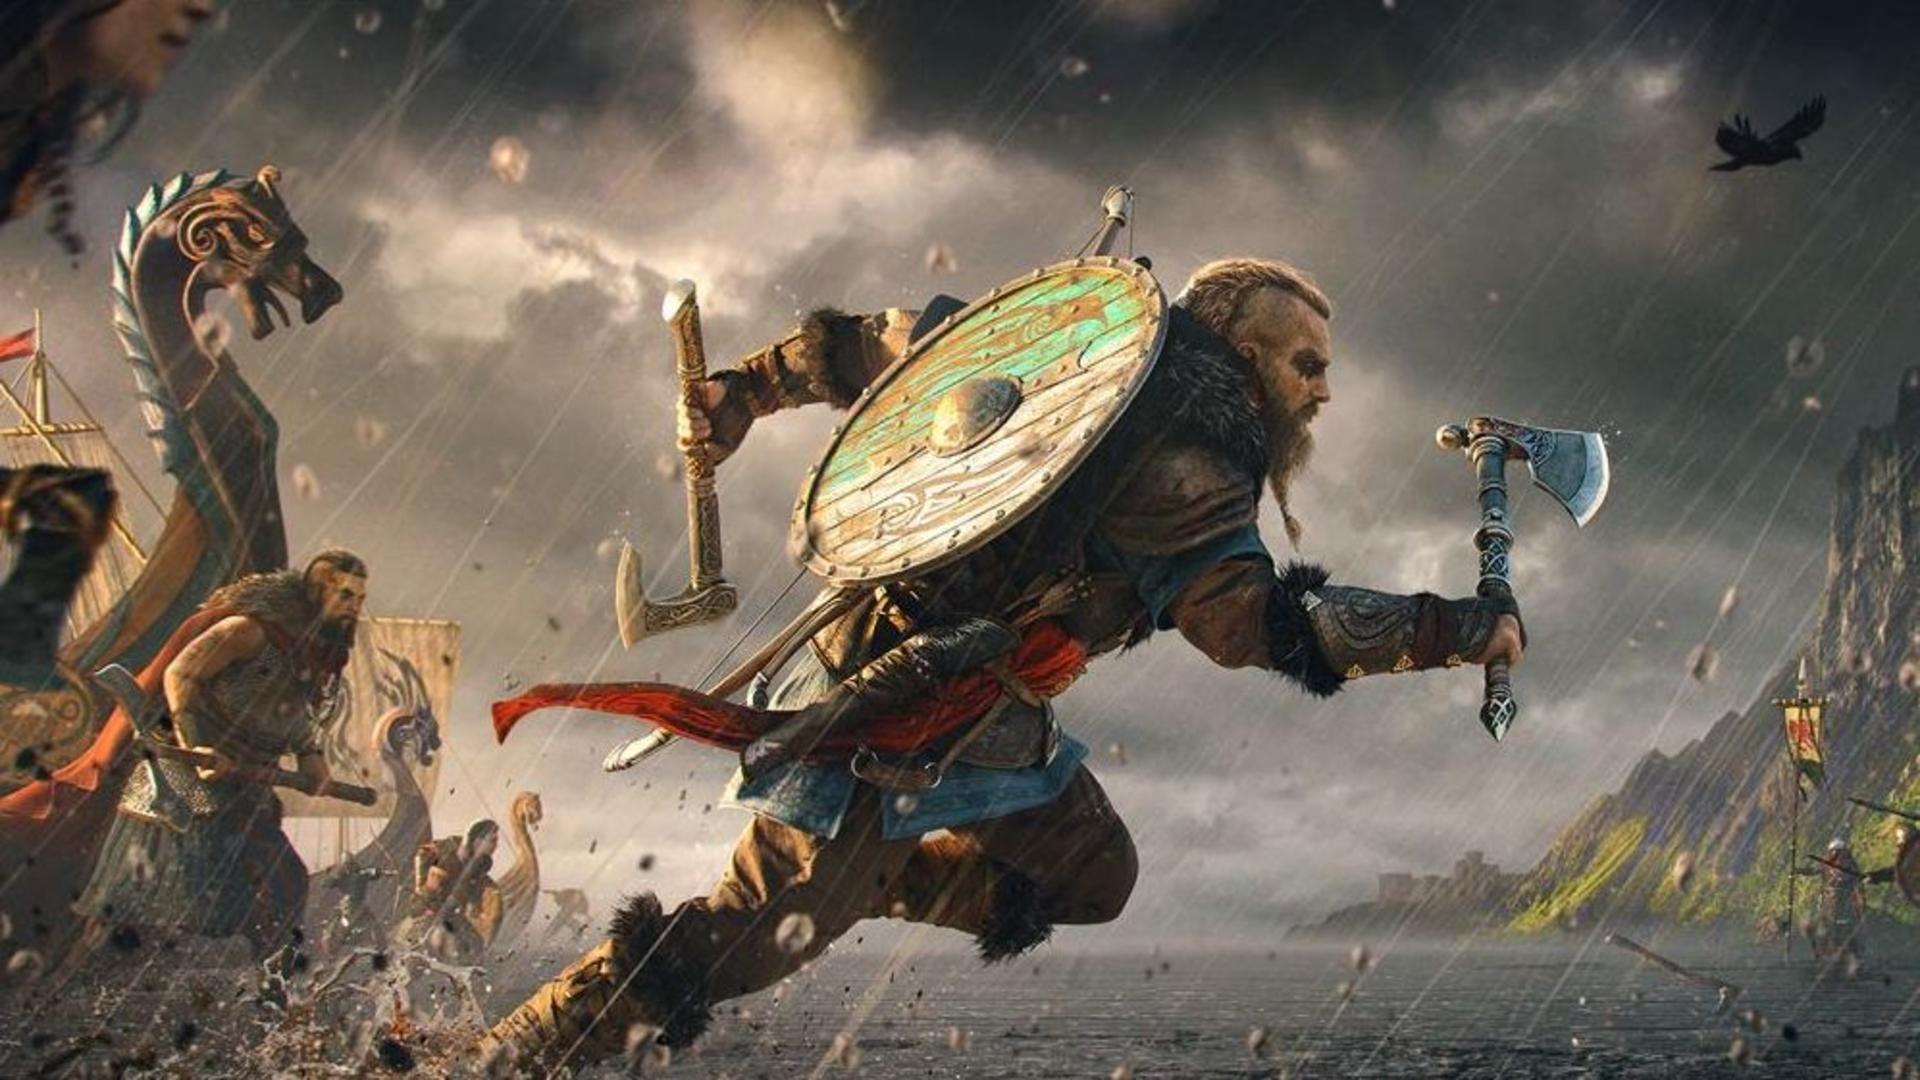 Assassin's Creed: Valhalla v 9 minutách z Xbox Series X, naše recenze už v pondělí